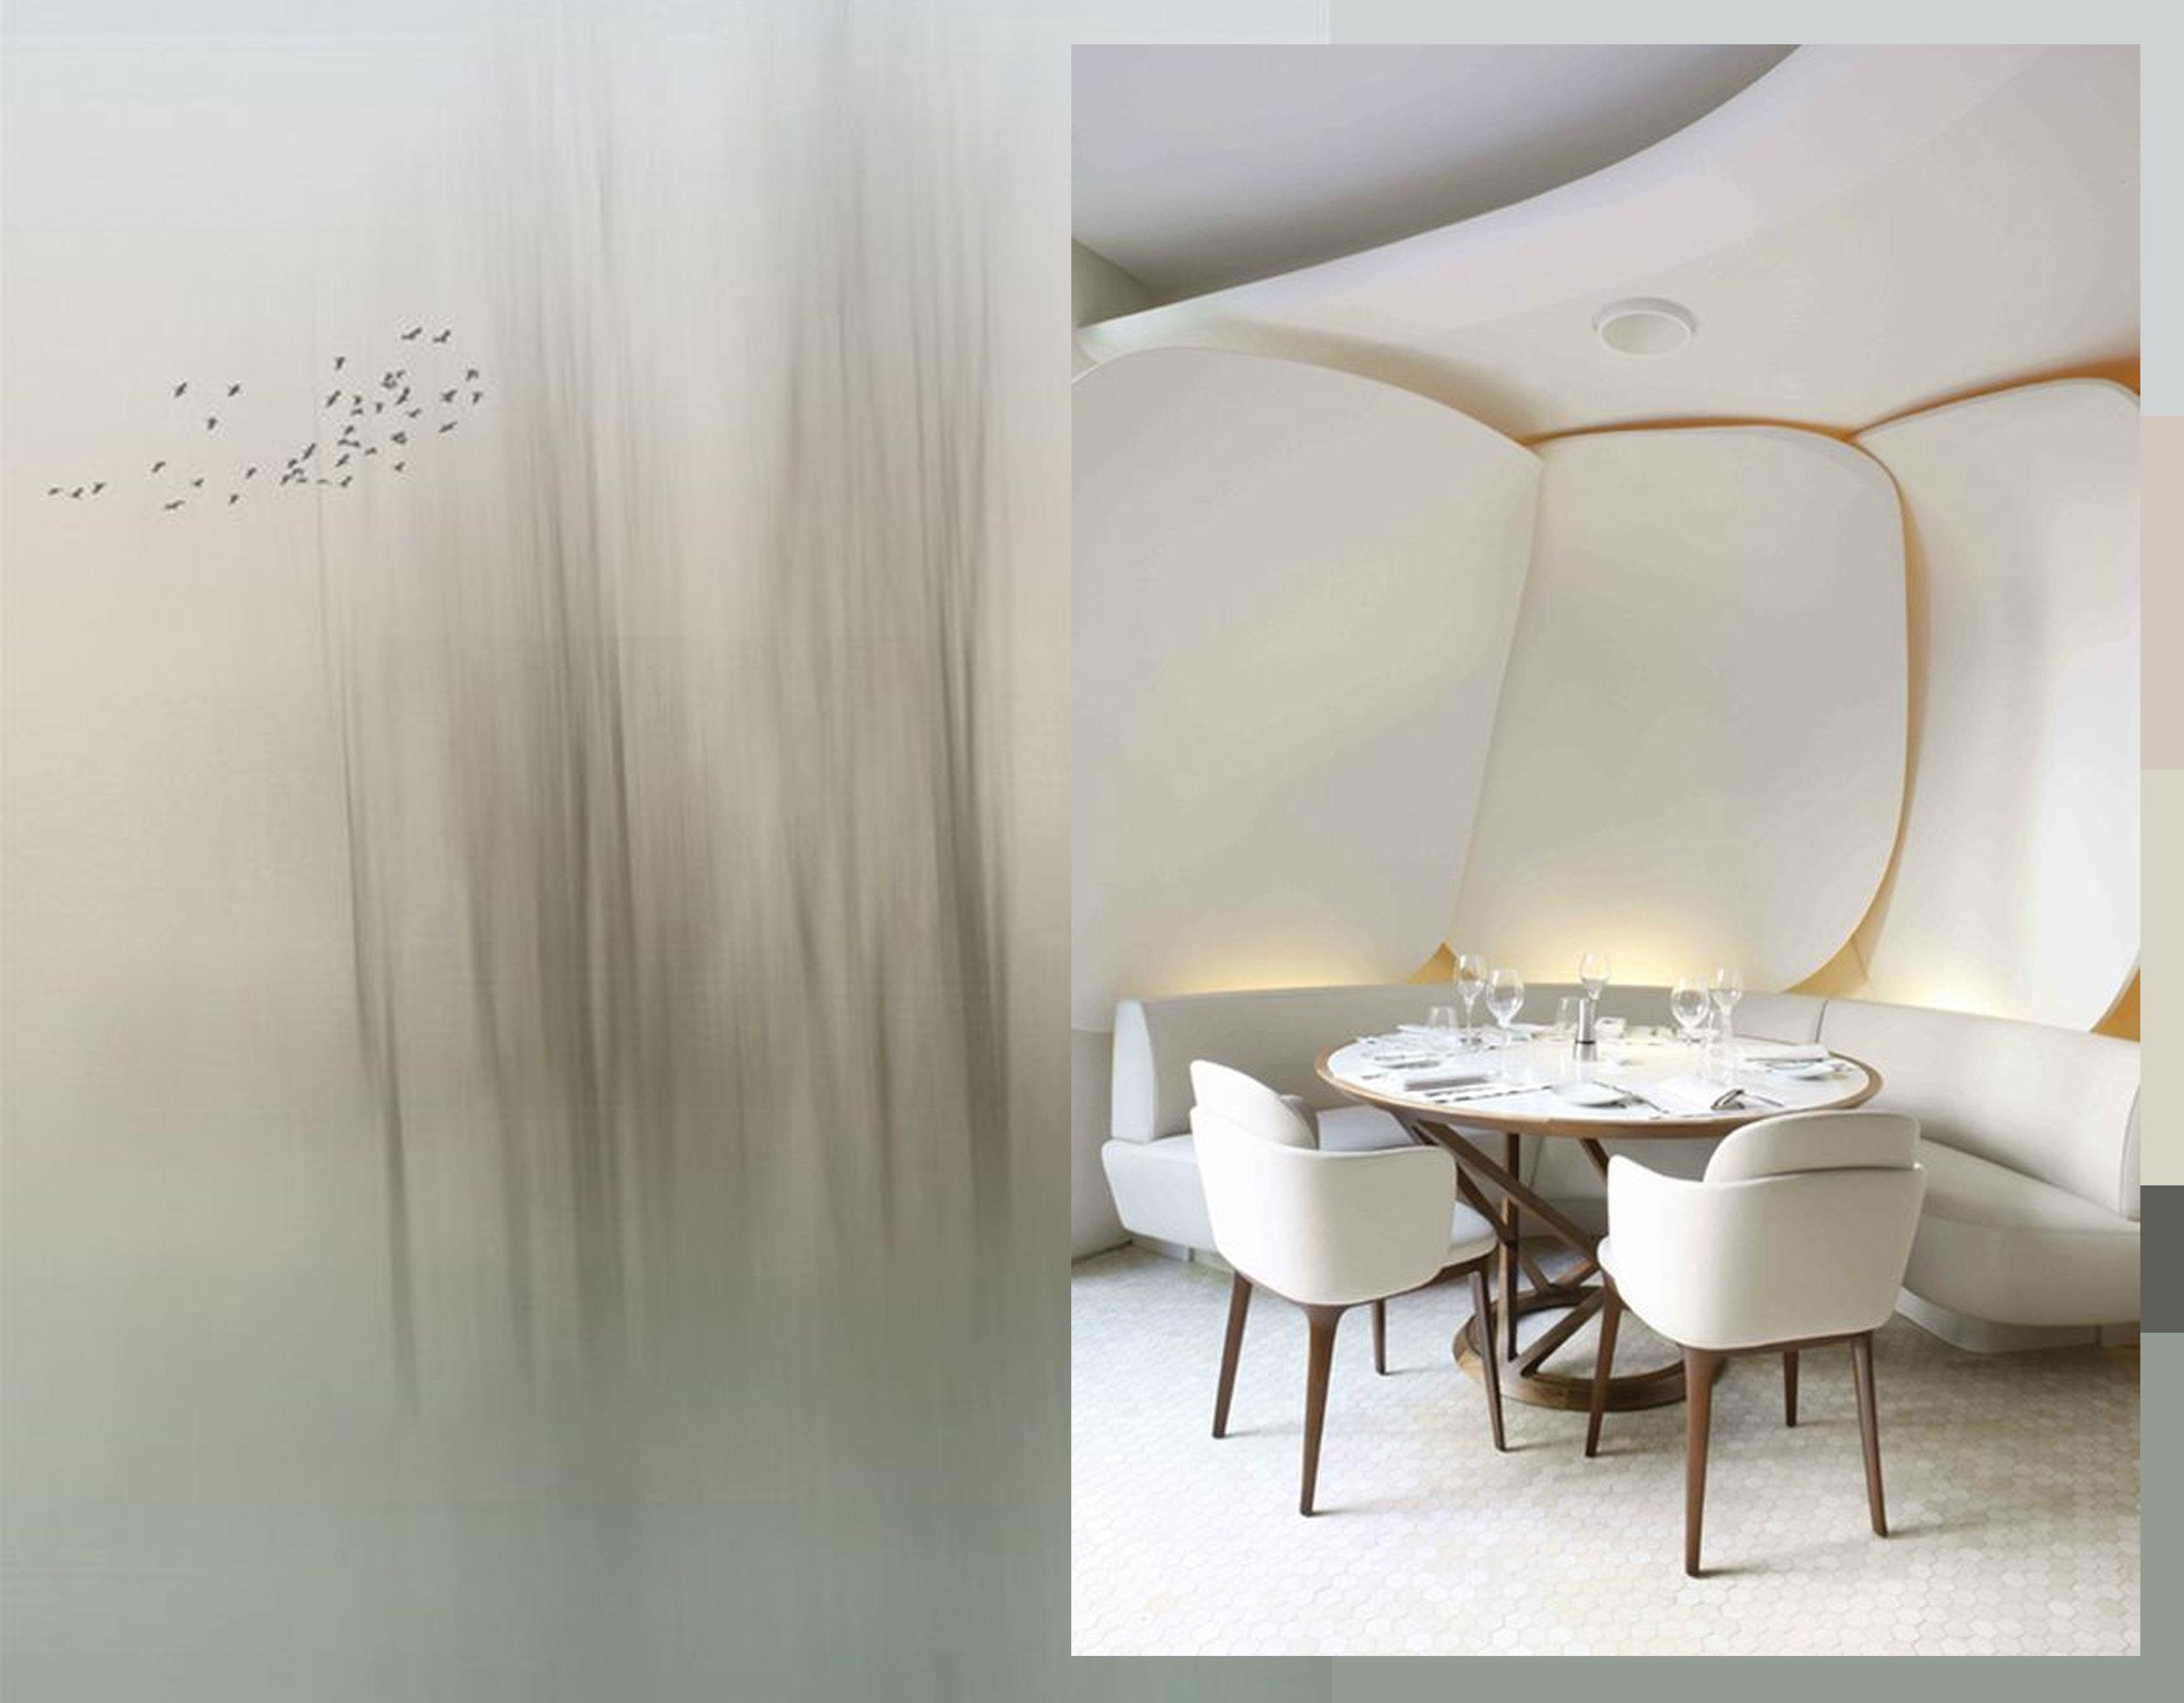 Breeze of Winter via   Fotoblur  - restaurant in Mandarin Oriental hotel via  DPages